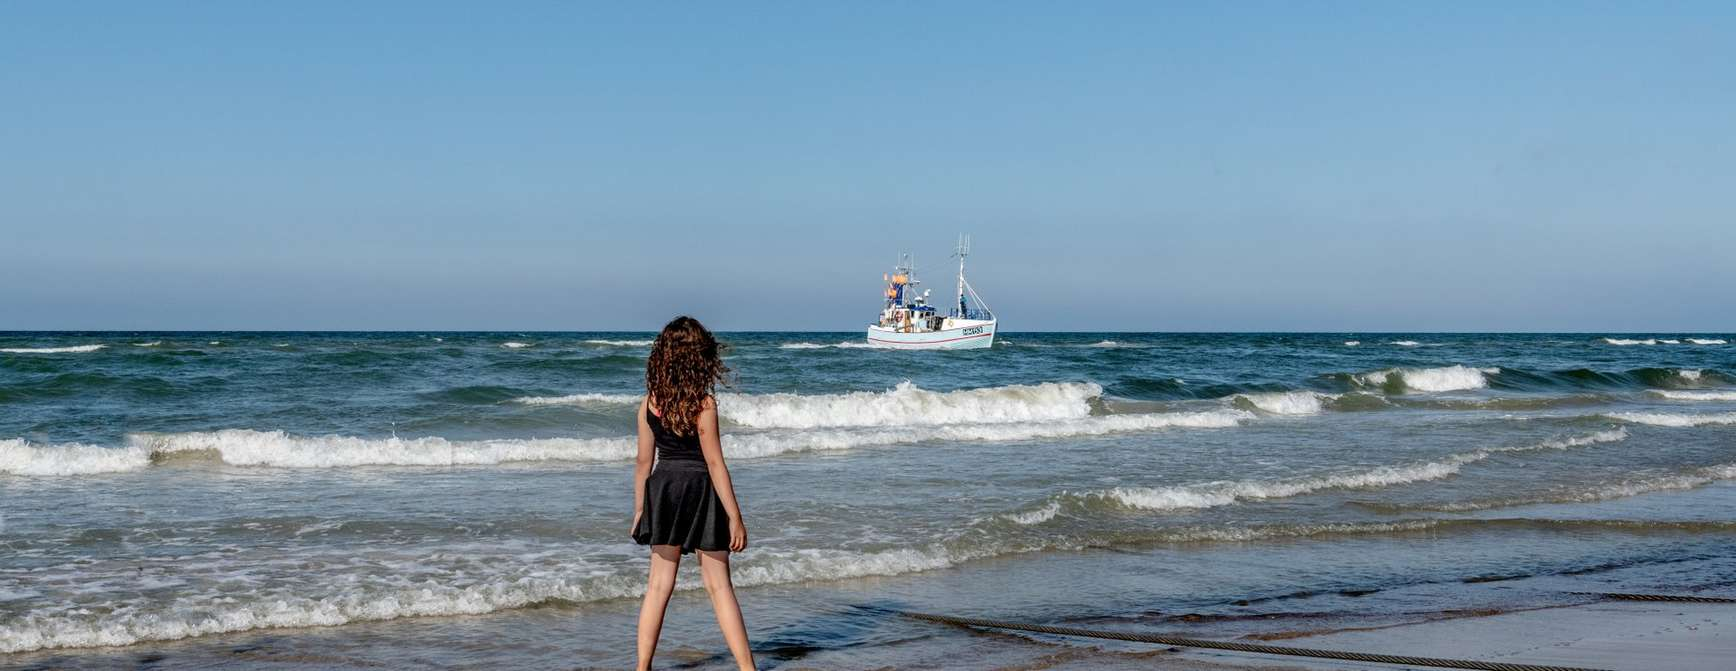 Alle årstider har sin sjarm på Thorup Strand. Foto: Visit Denmark/© Mette Johnsen